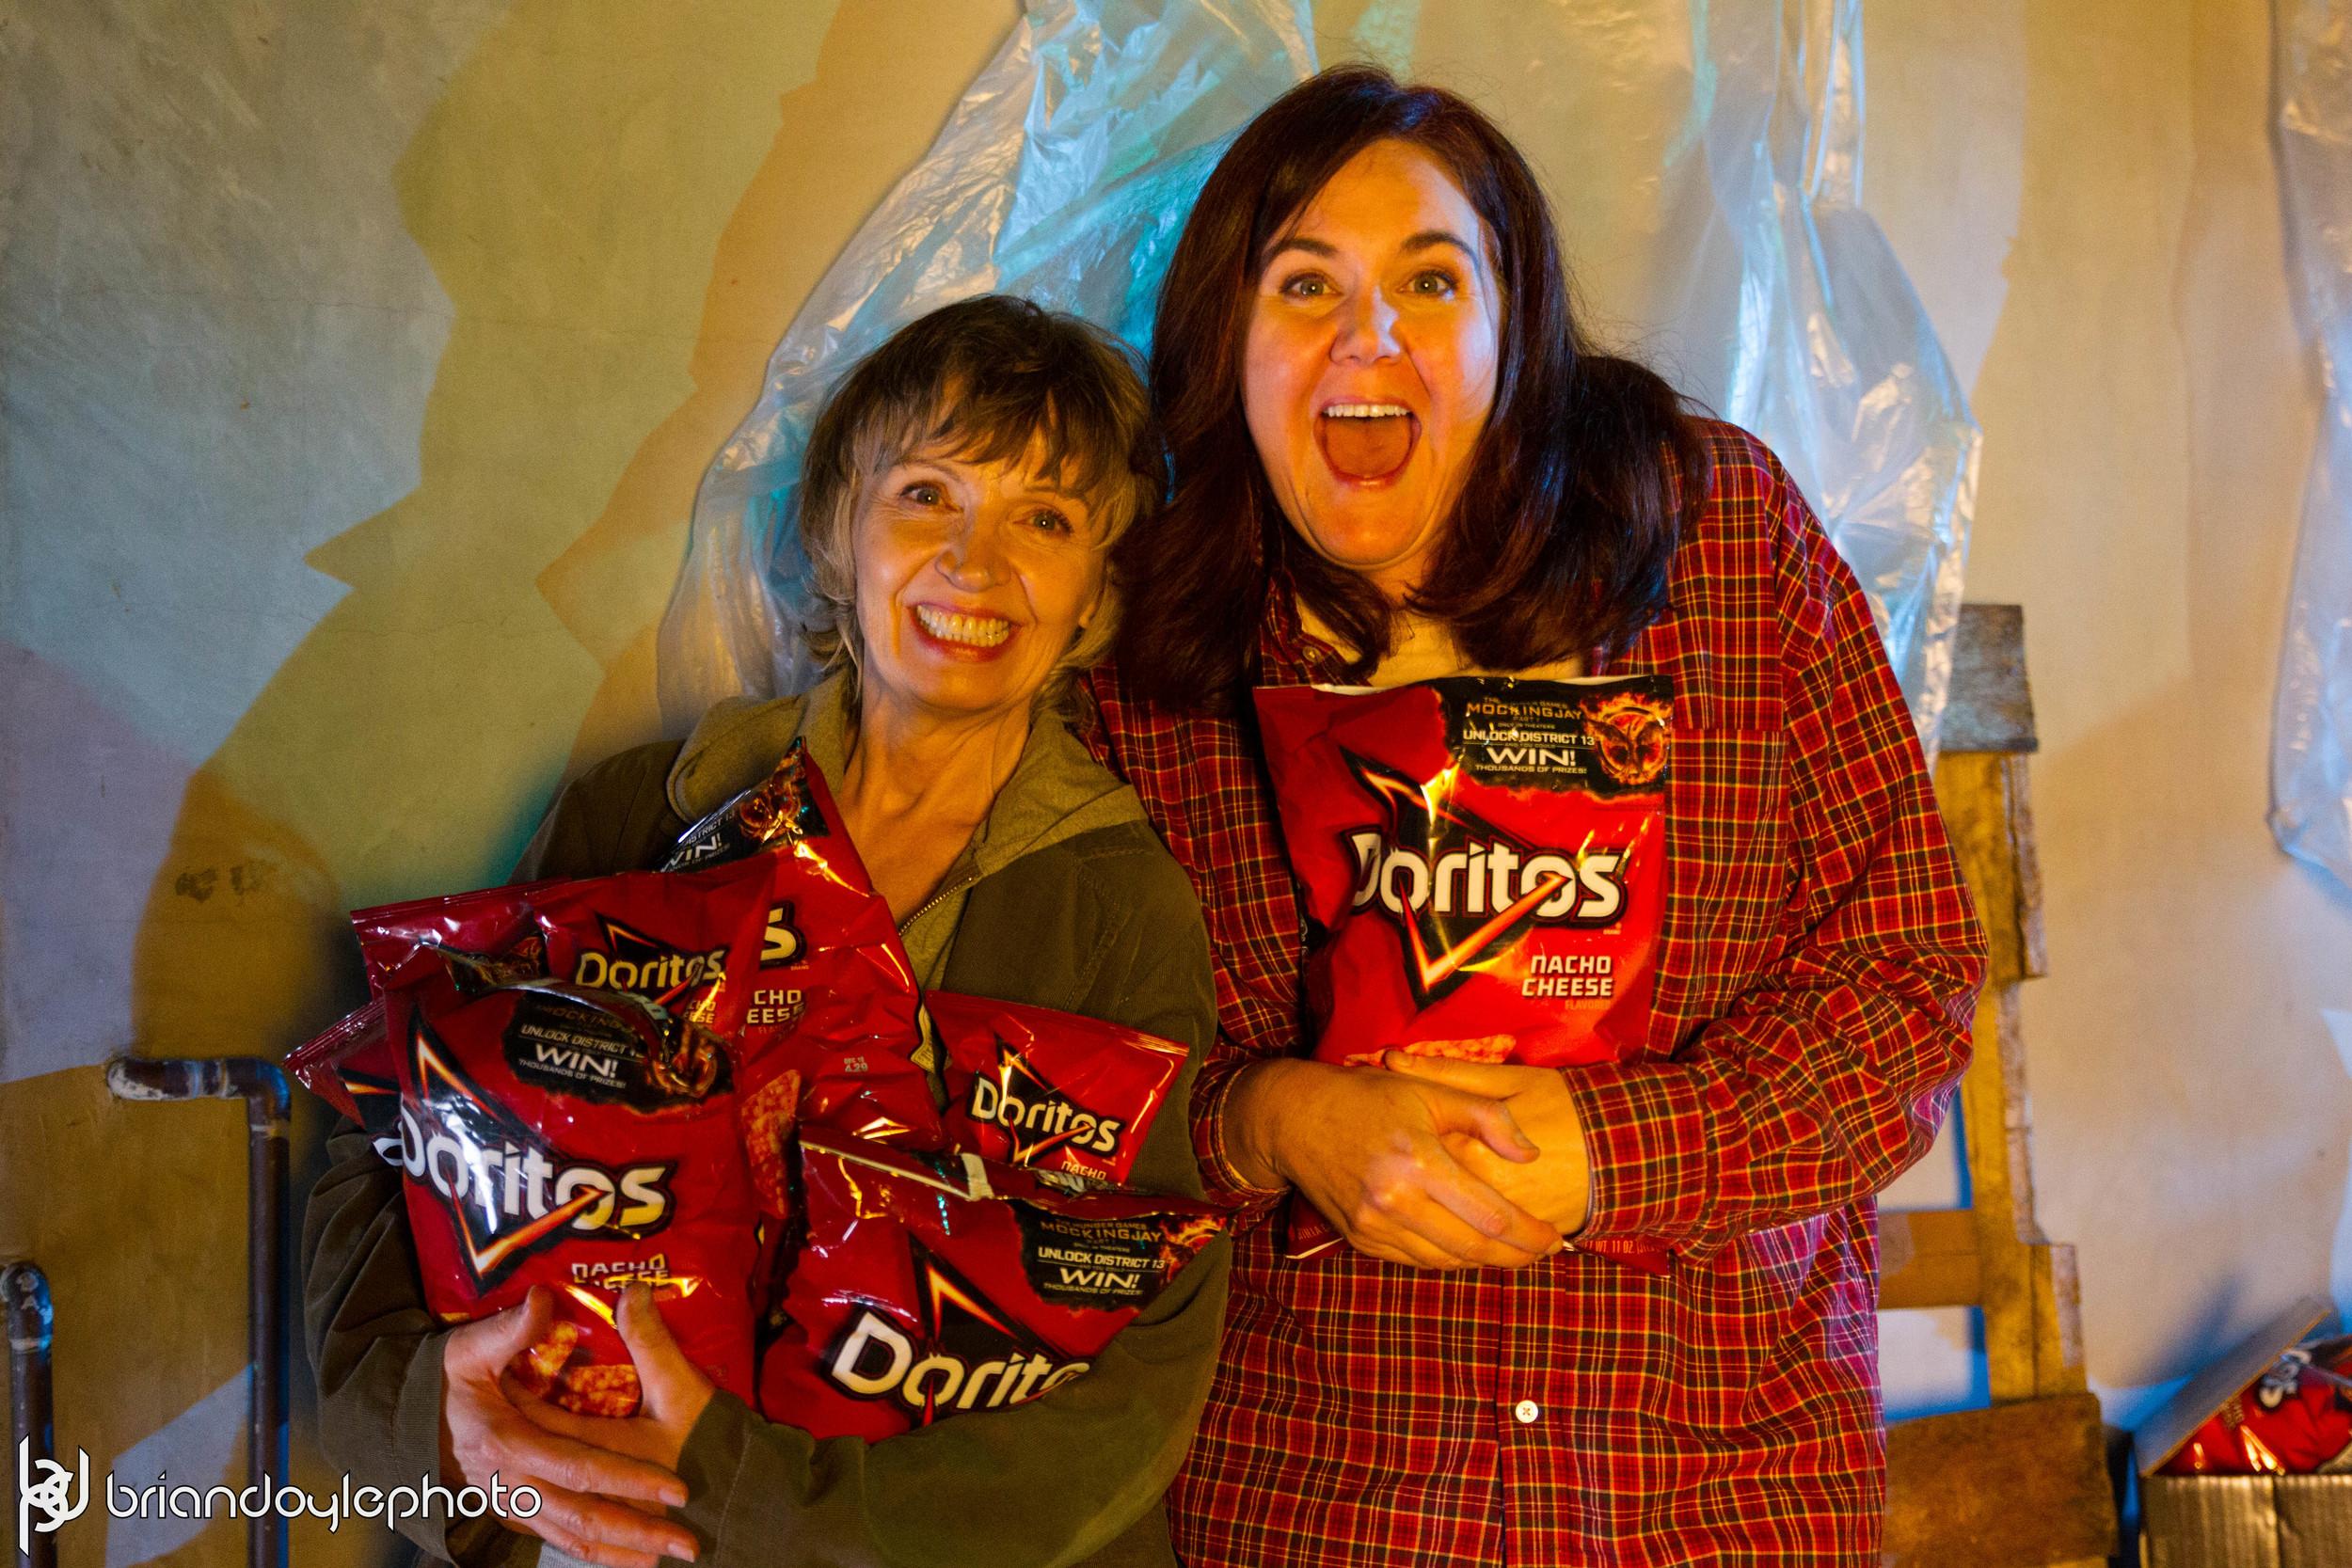 Doritos Super Bowl Commercial 2014.10.25-60.jpg